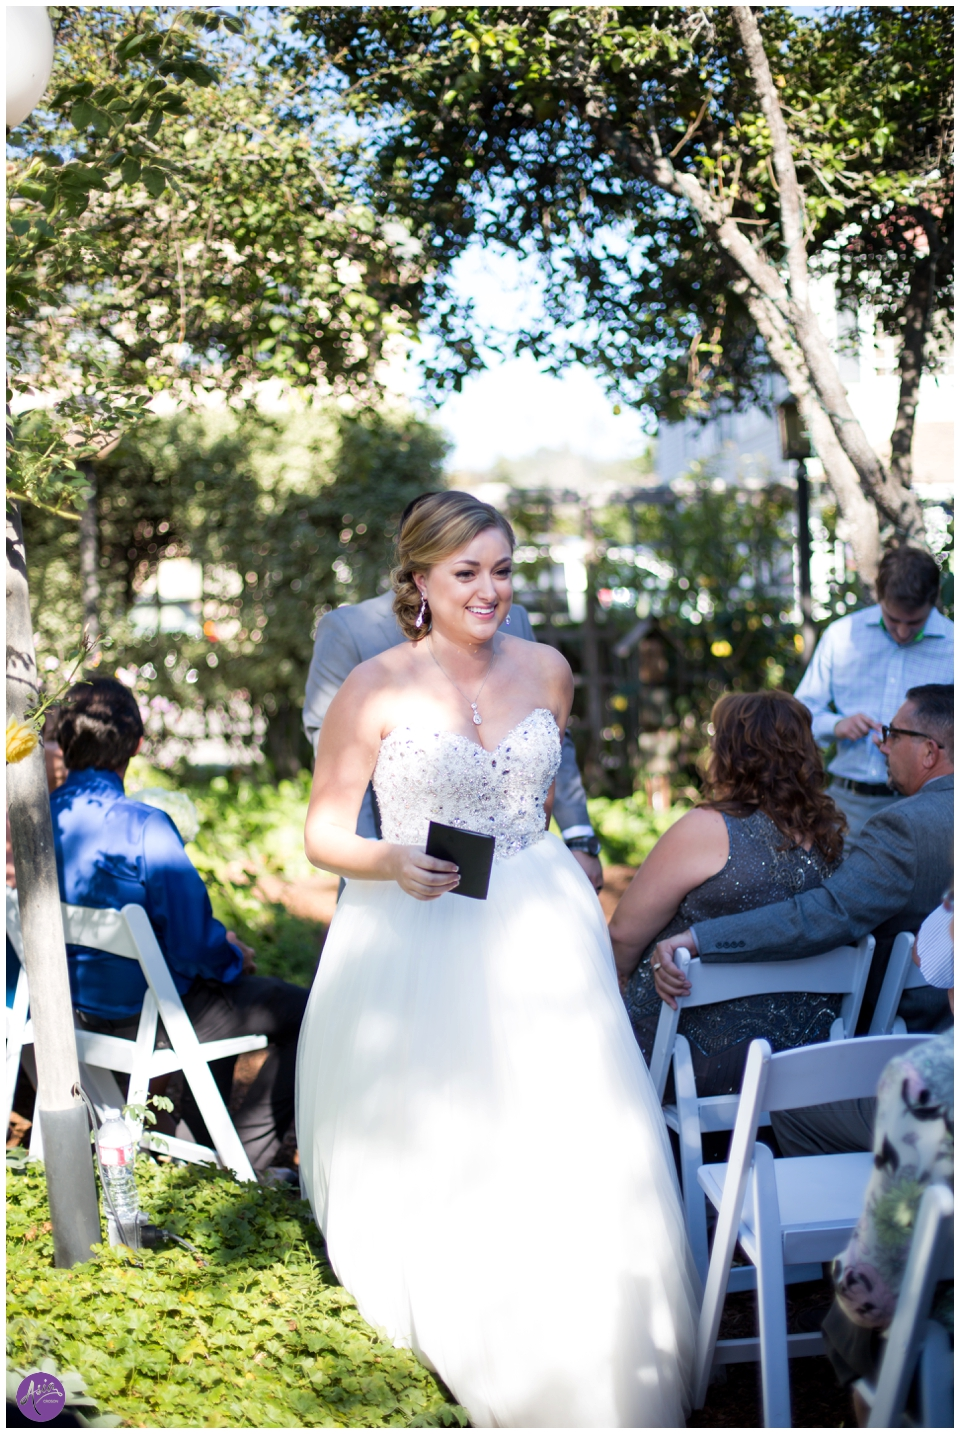 Wedding Photographer Asia Croson Photography San Luis Obispo-3273_Asia Croson Photography stomped.jpg